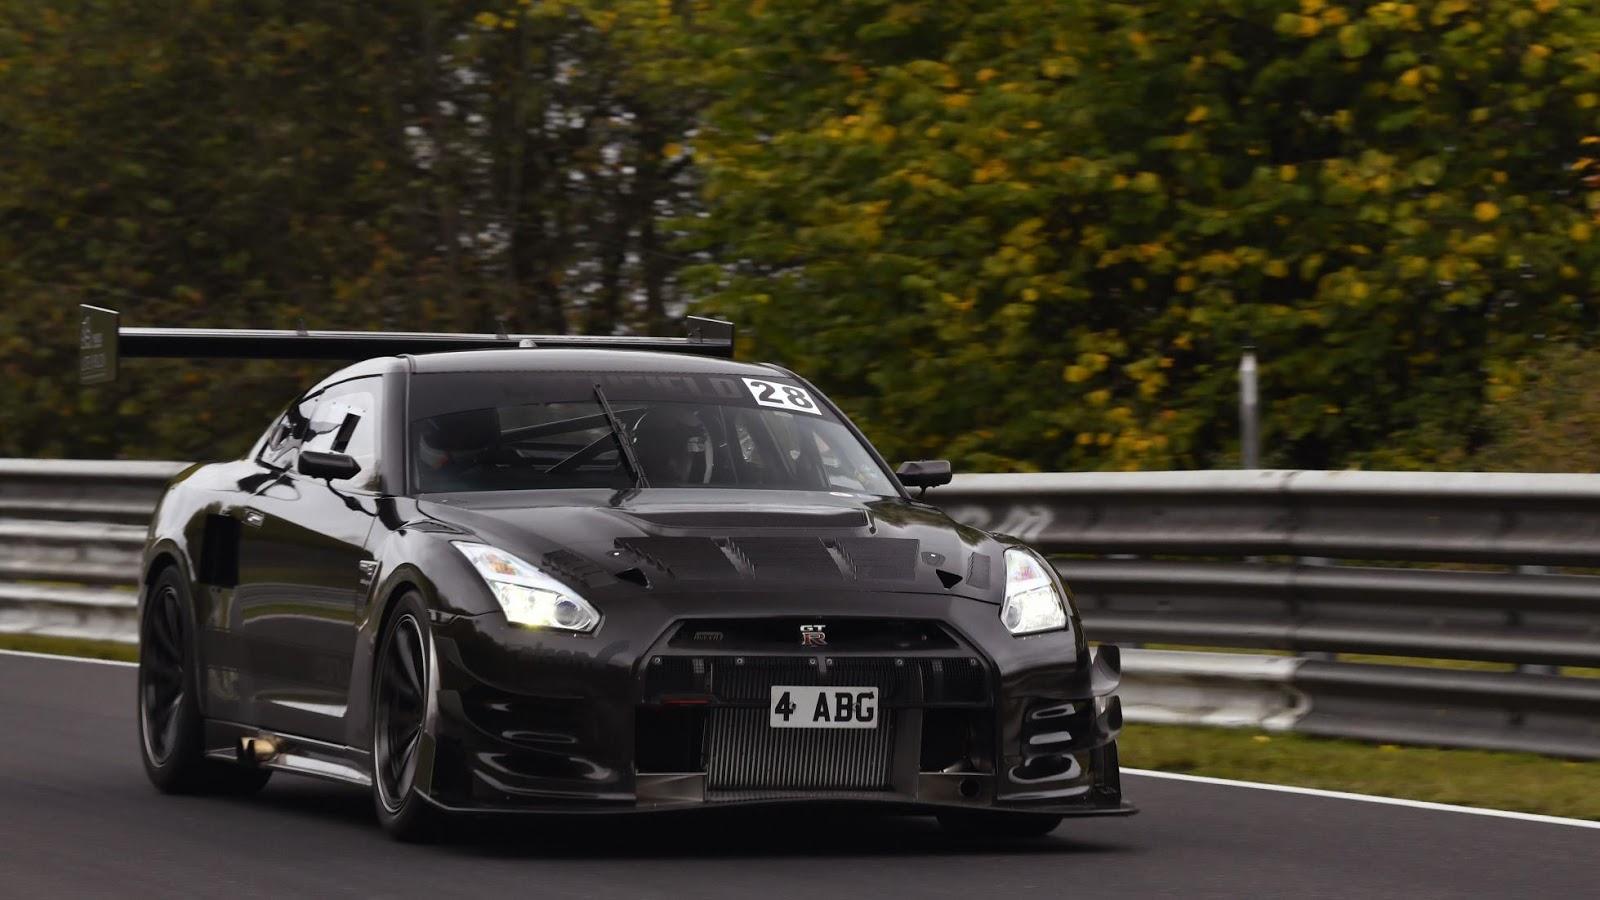 Litchfield-Nissan-GT-R-Nurburgring-14